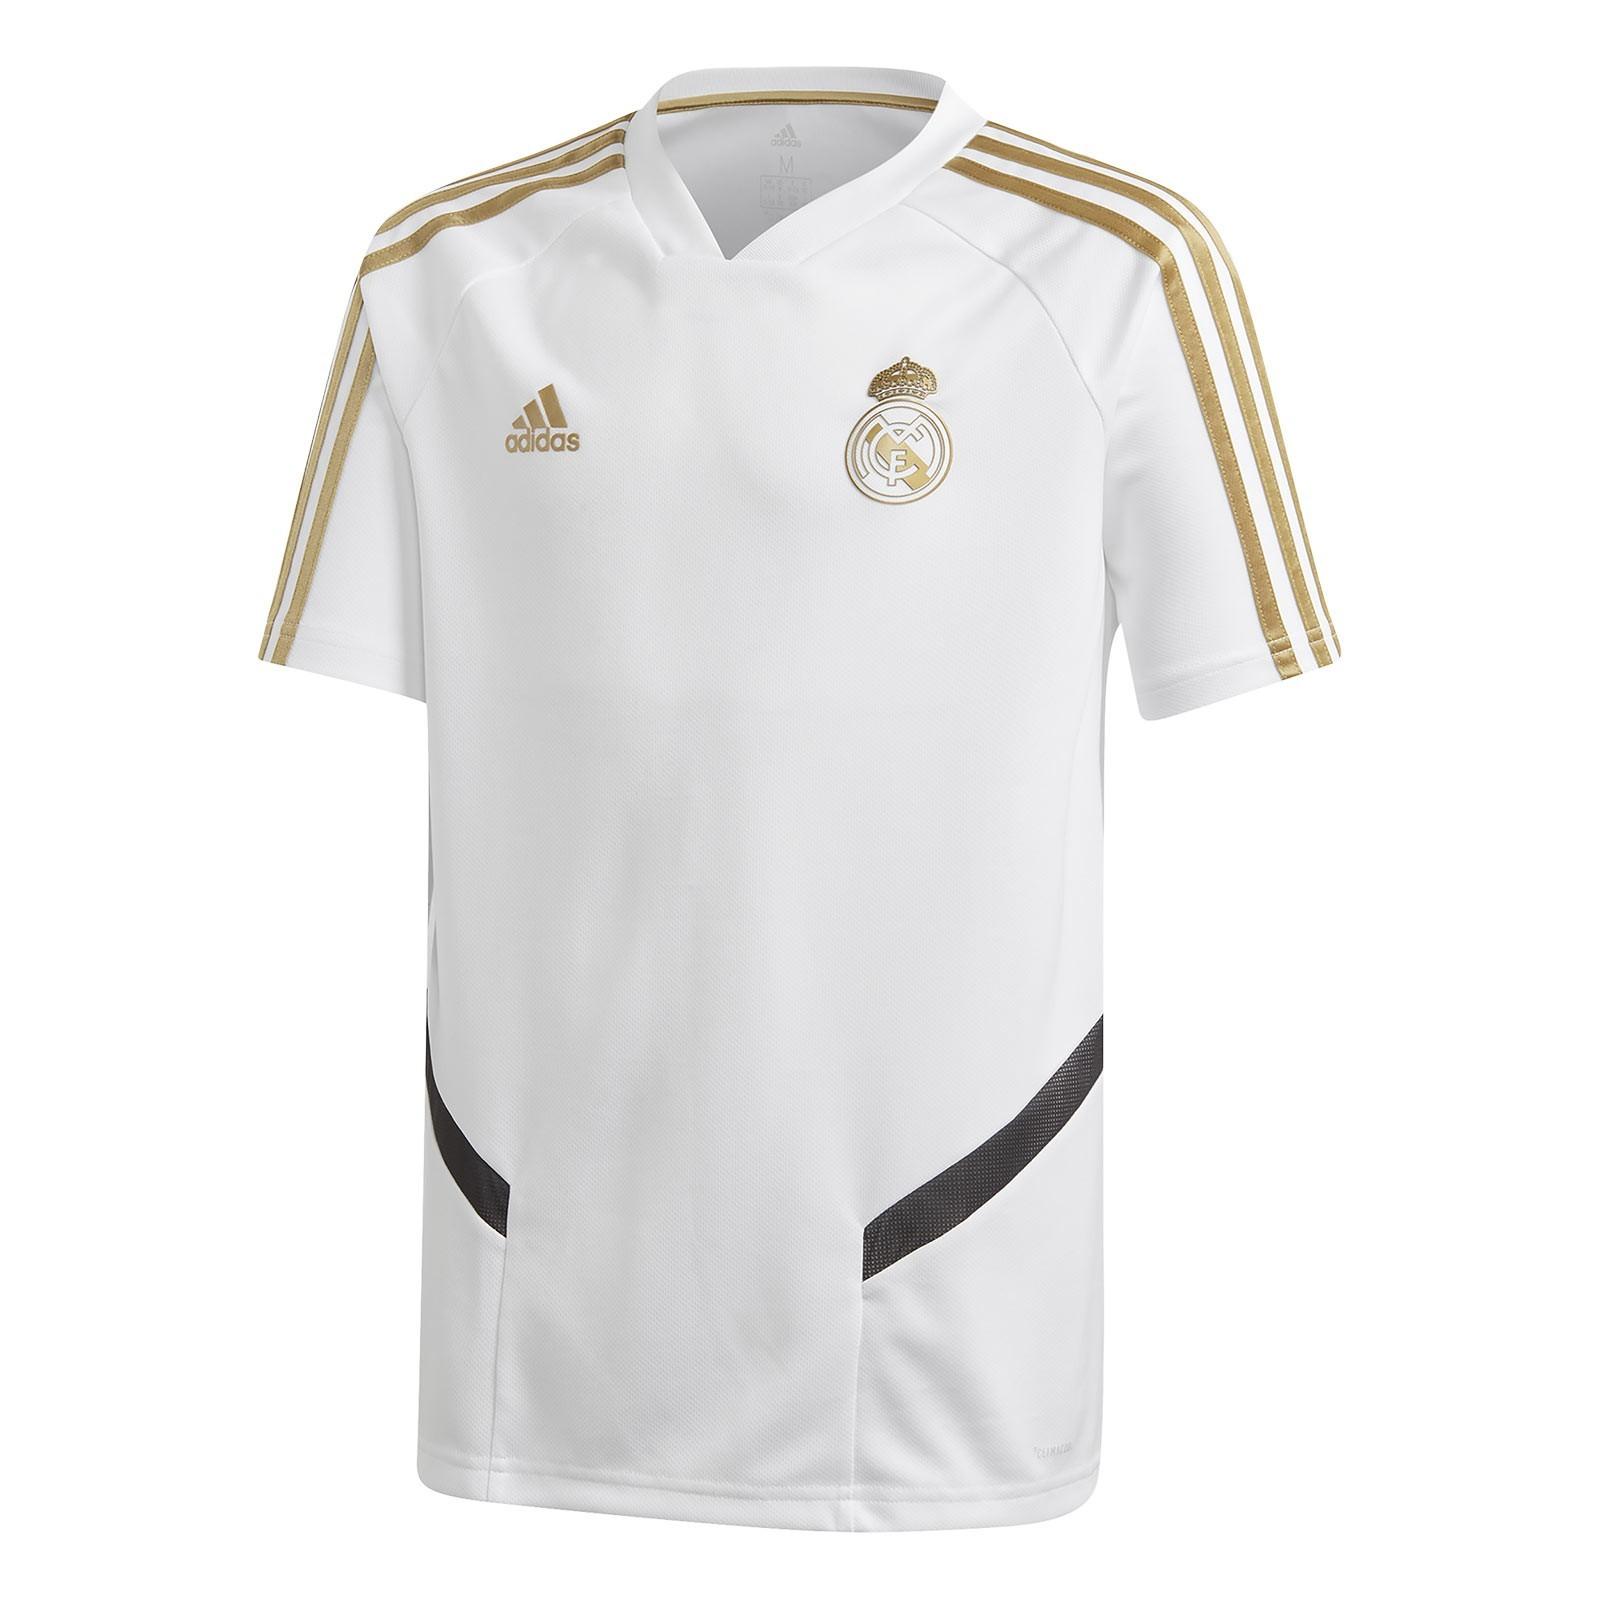 Comprar Camiseta Adidas Real Madrid 20192020 Blanco